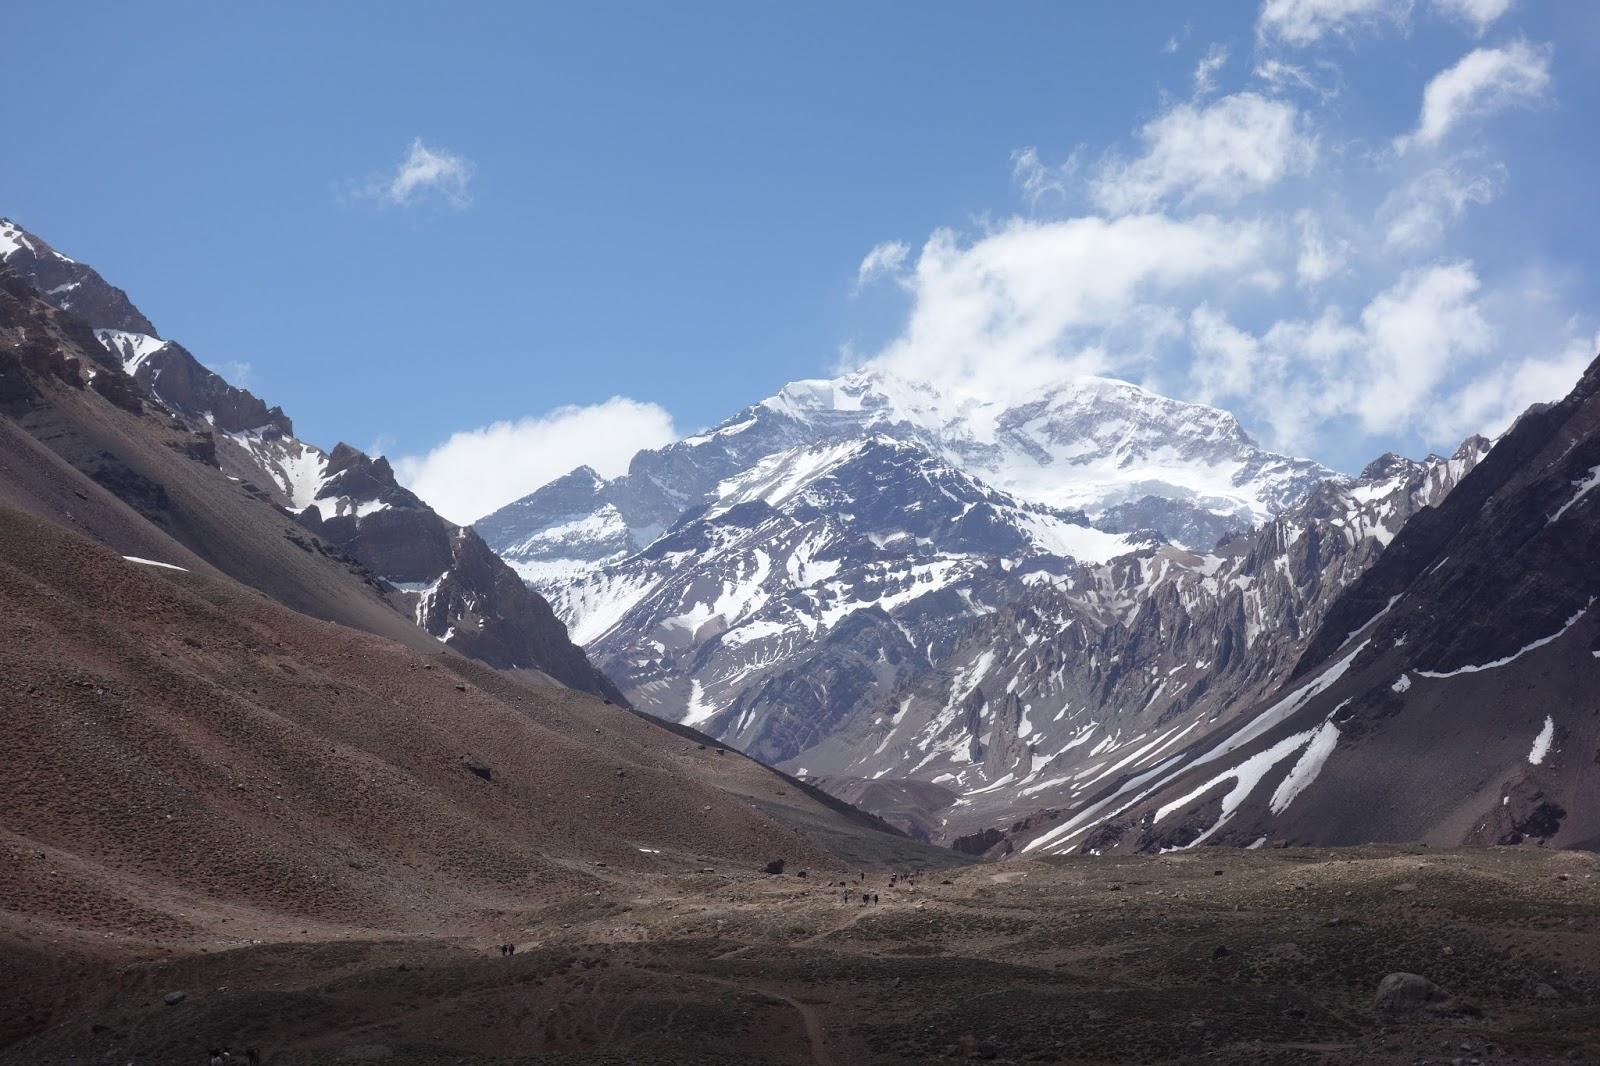 Annika & rick op avontuur: lake district en noord argentinië & chili